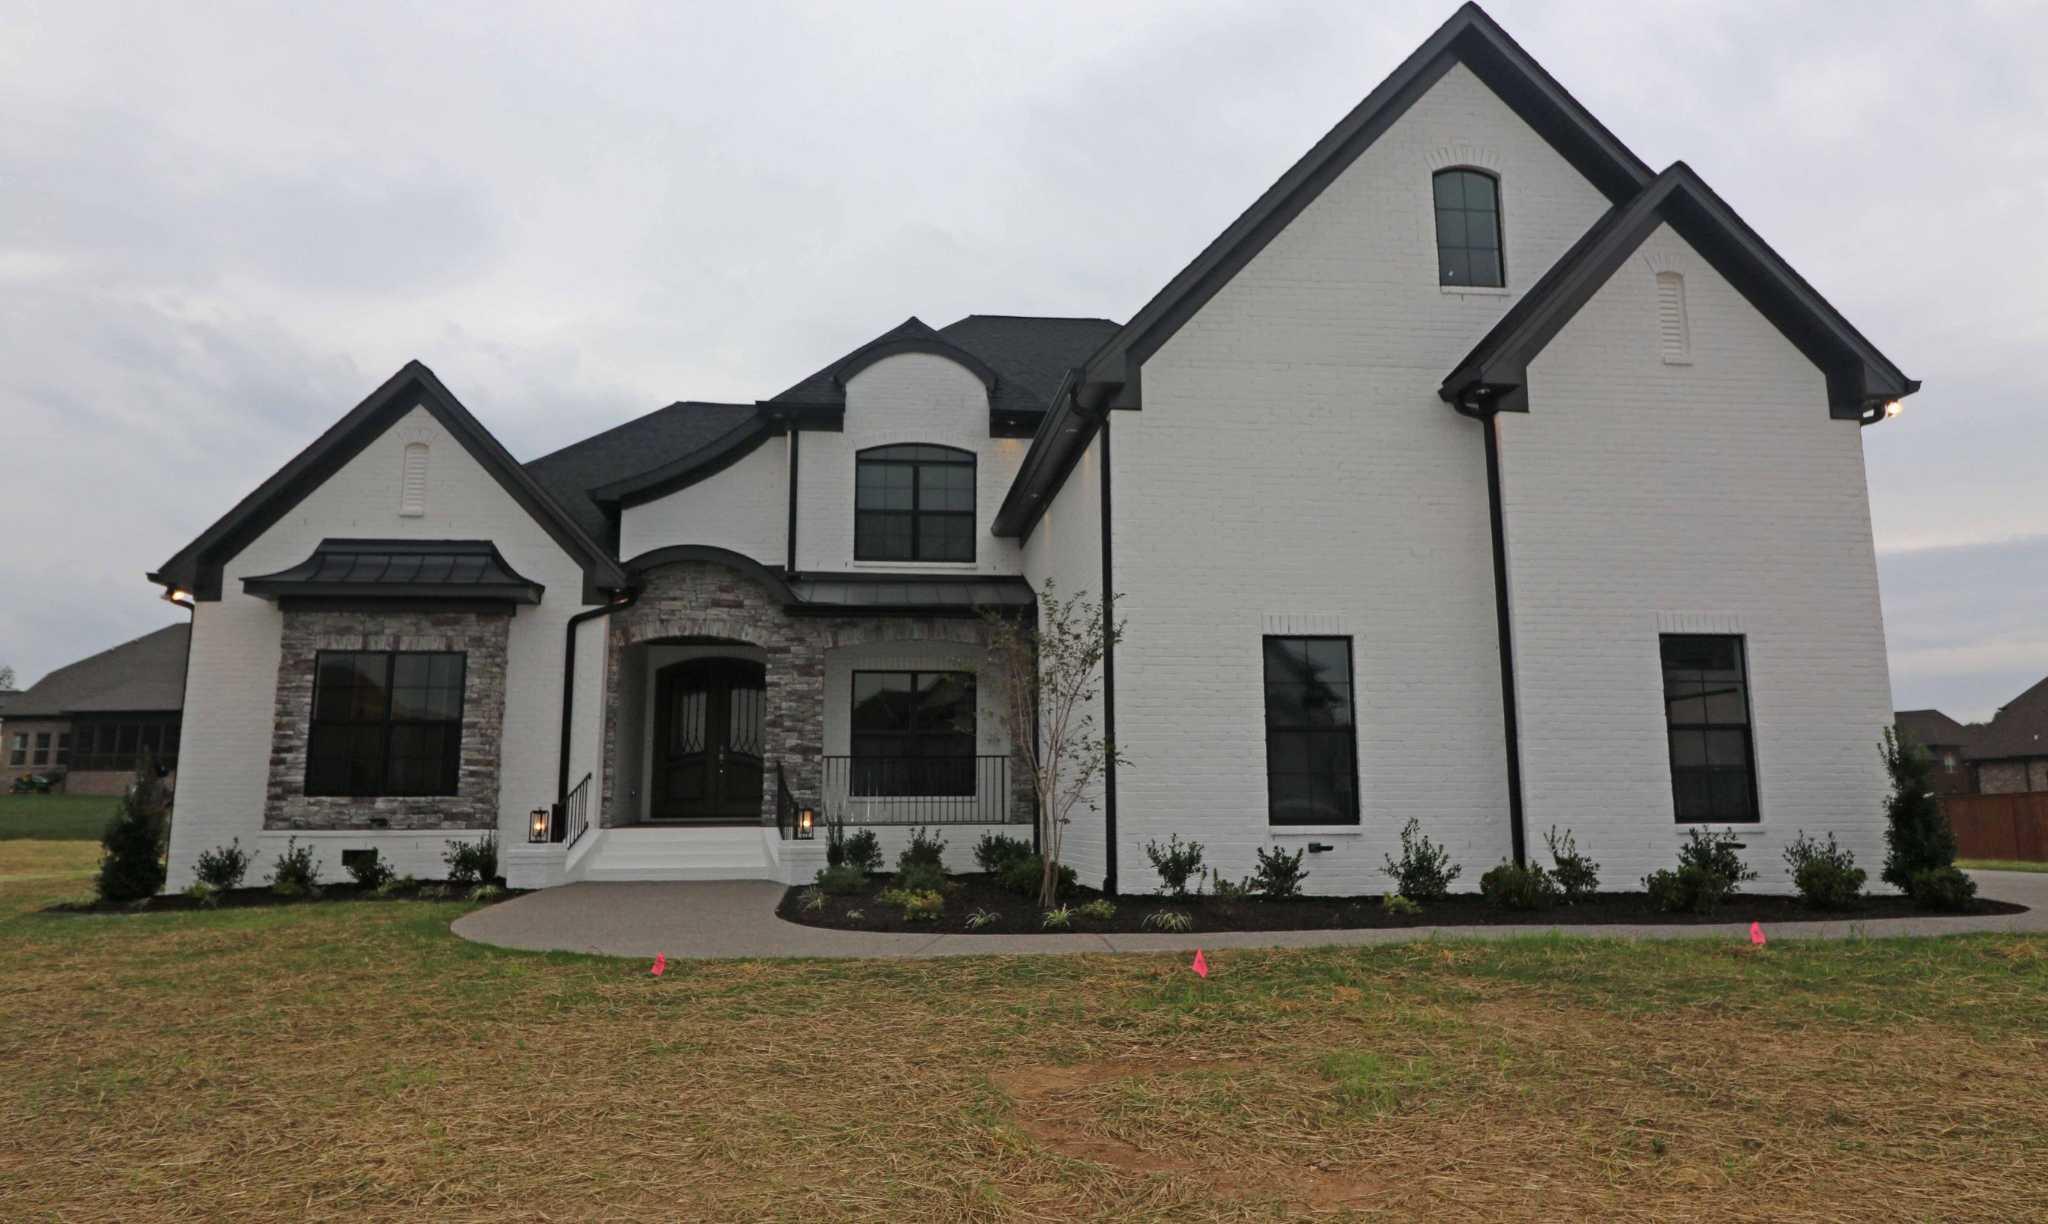 $949,900 - 4Br/5Ba -  for Sale in Wright Farms Sec. 5b, Mount Juliet